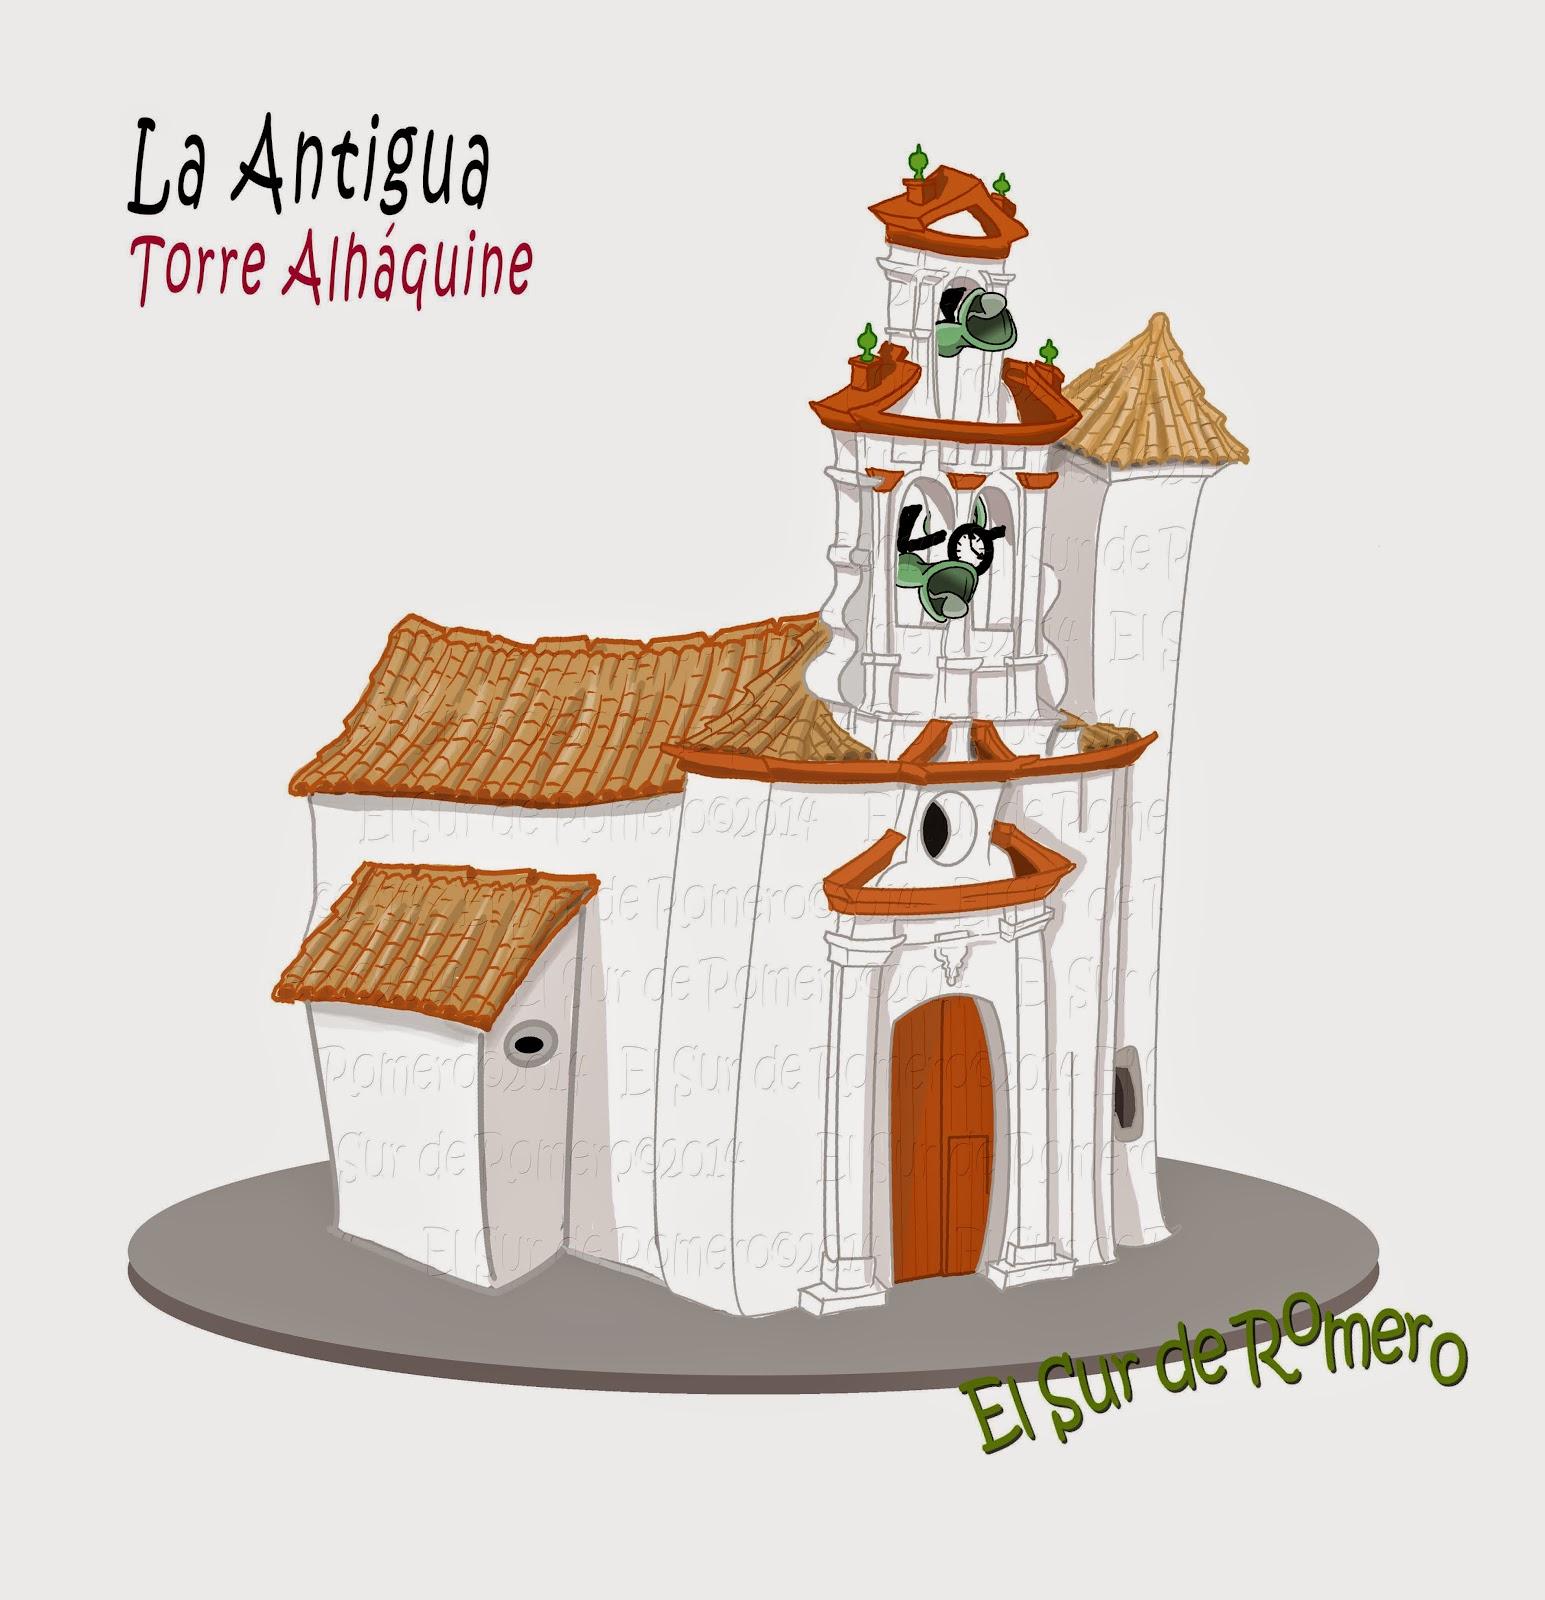 "<img src=""La Antigua.jpg"" alt=""Iglesia en cómic""/>"